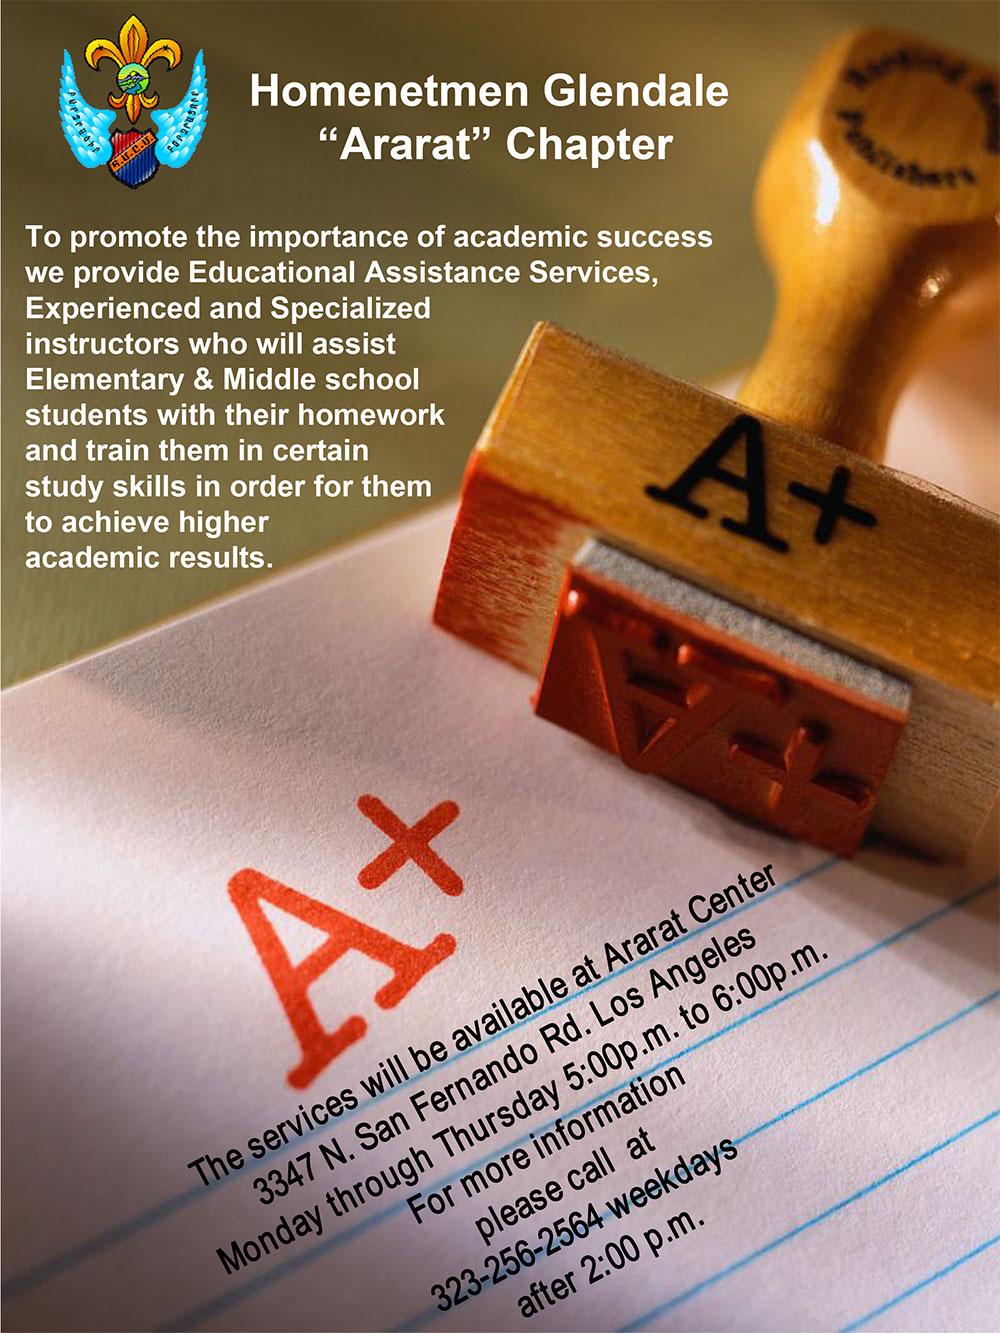 Educational Assistance Services